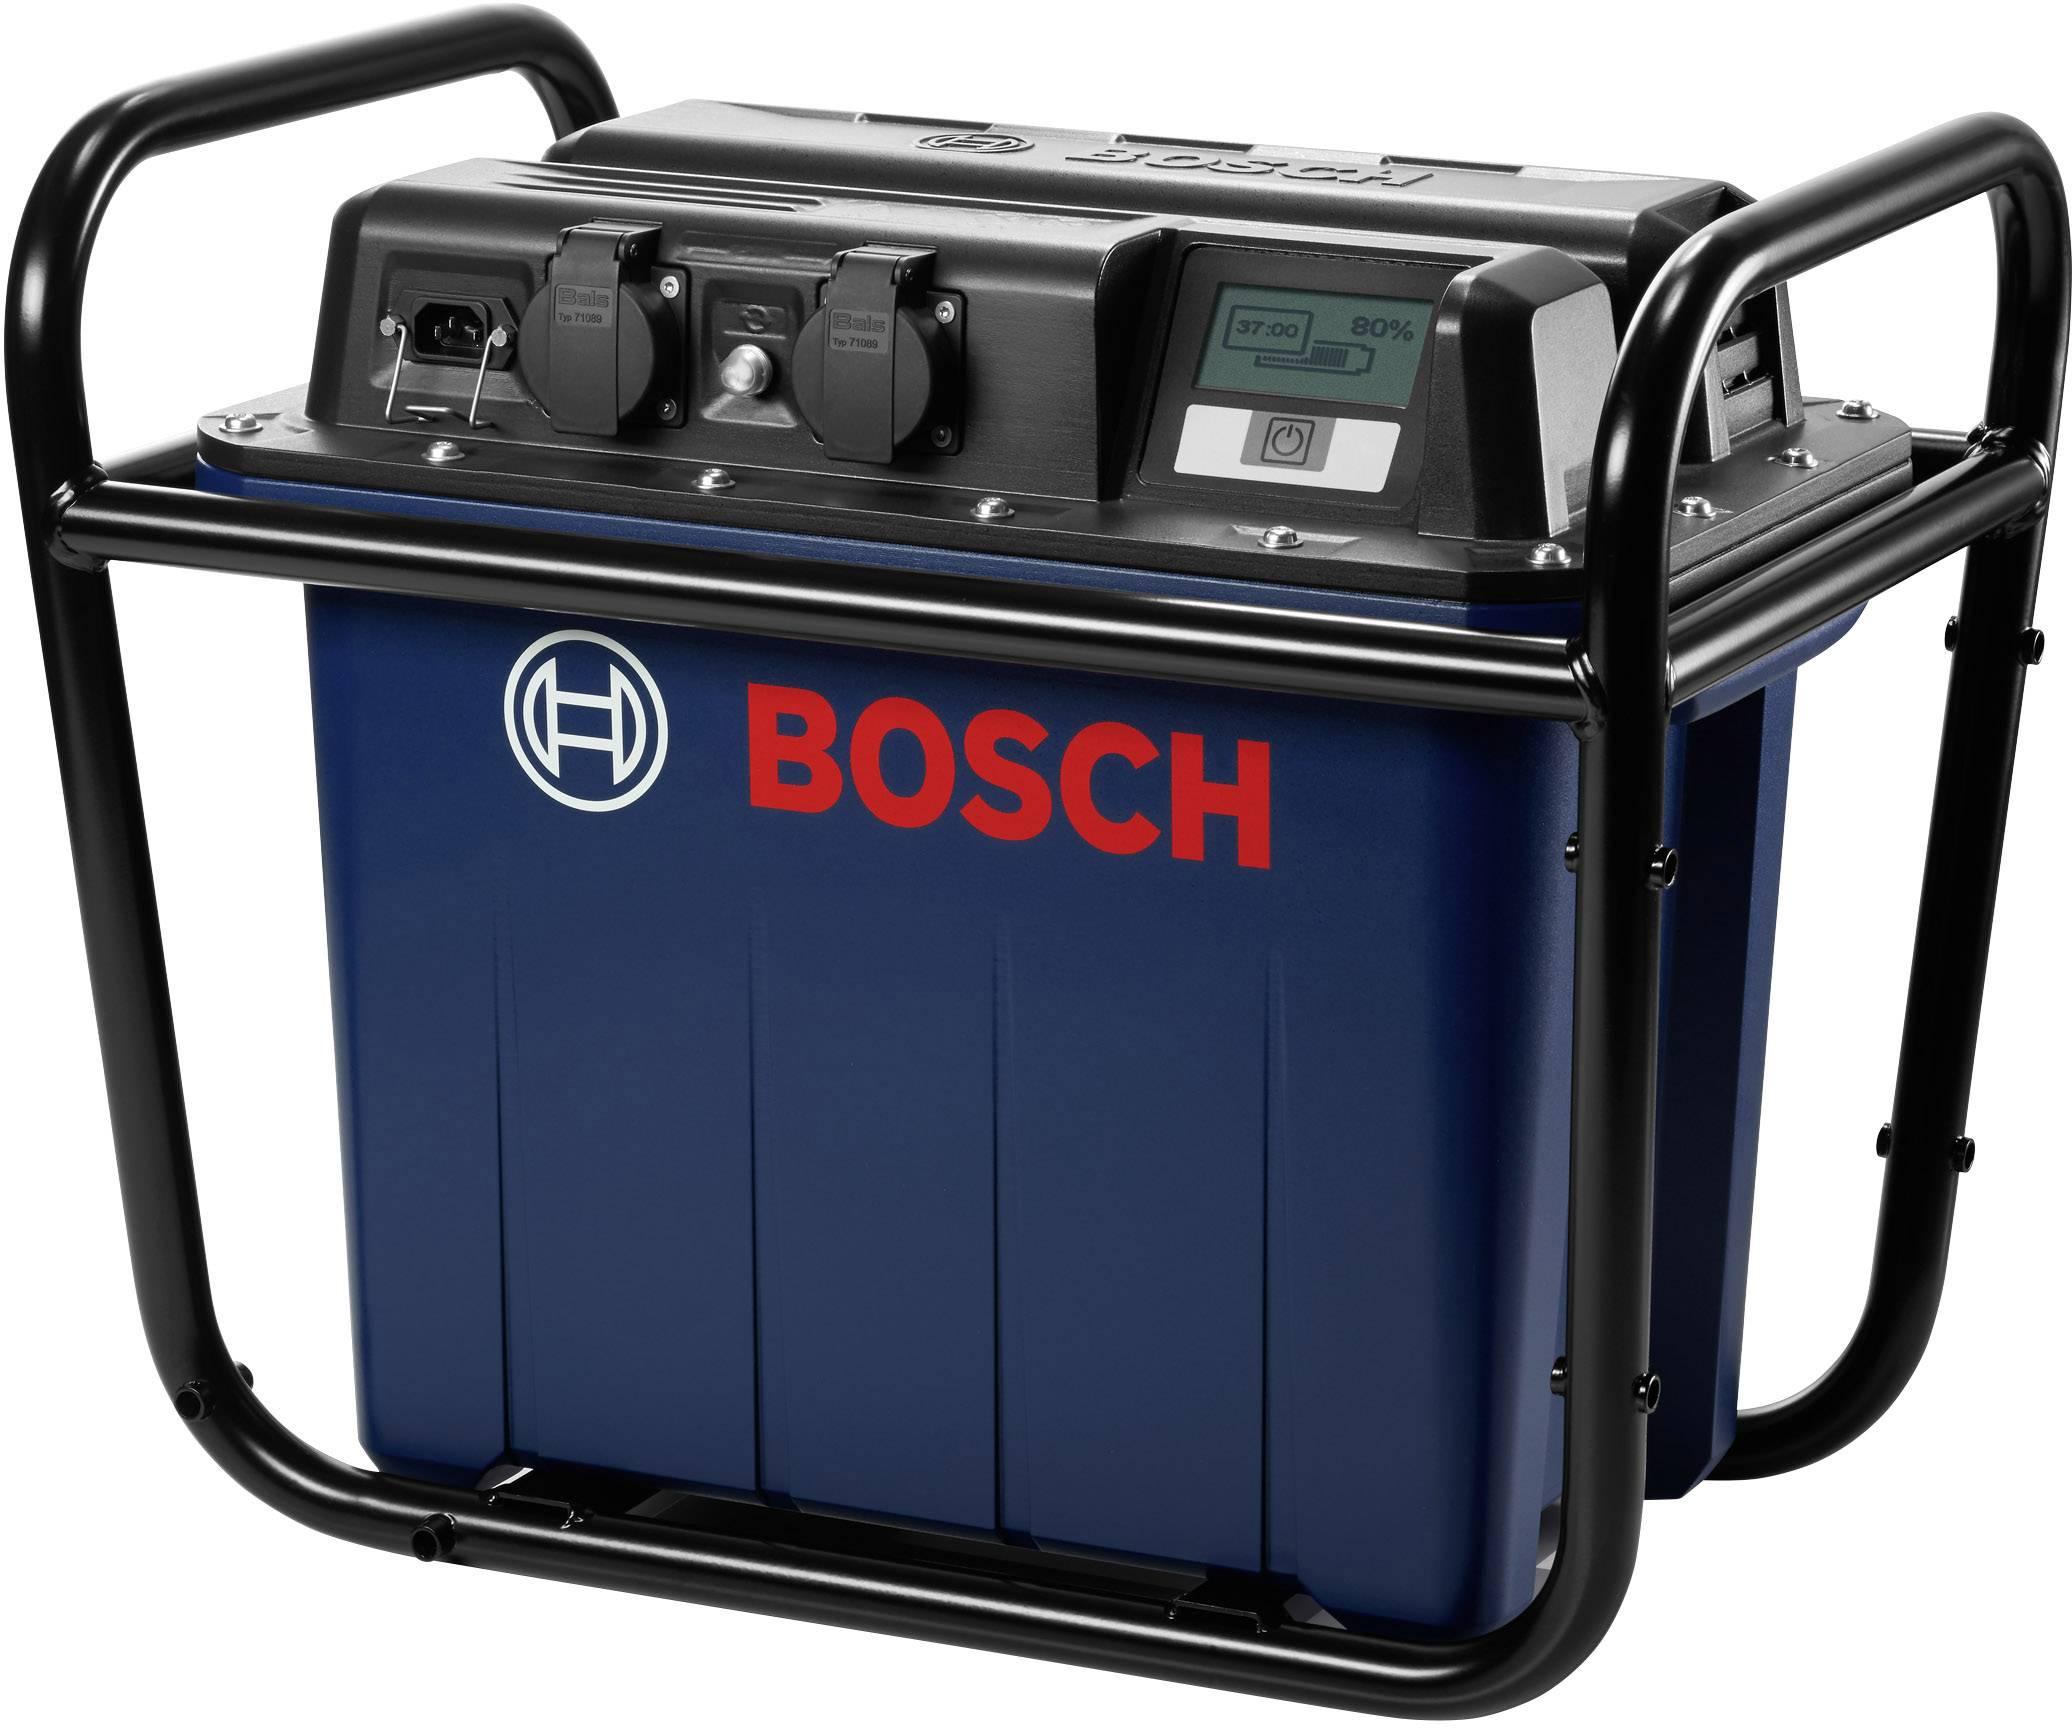 Bosch Professional generátor proudu 600915000